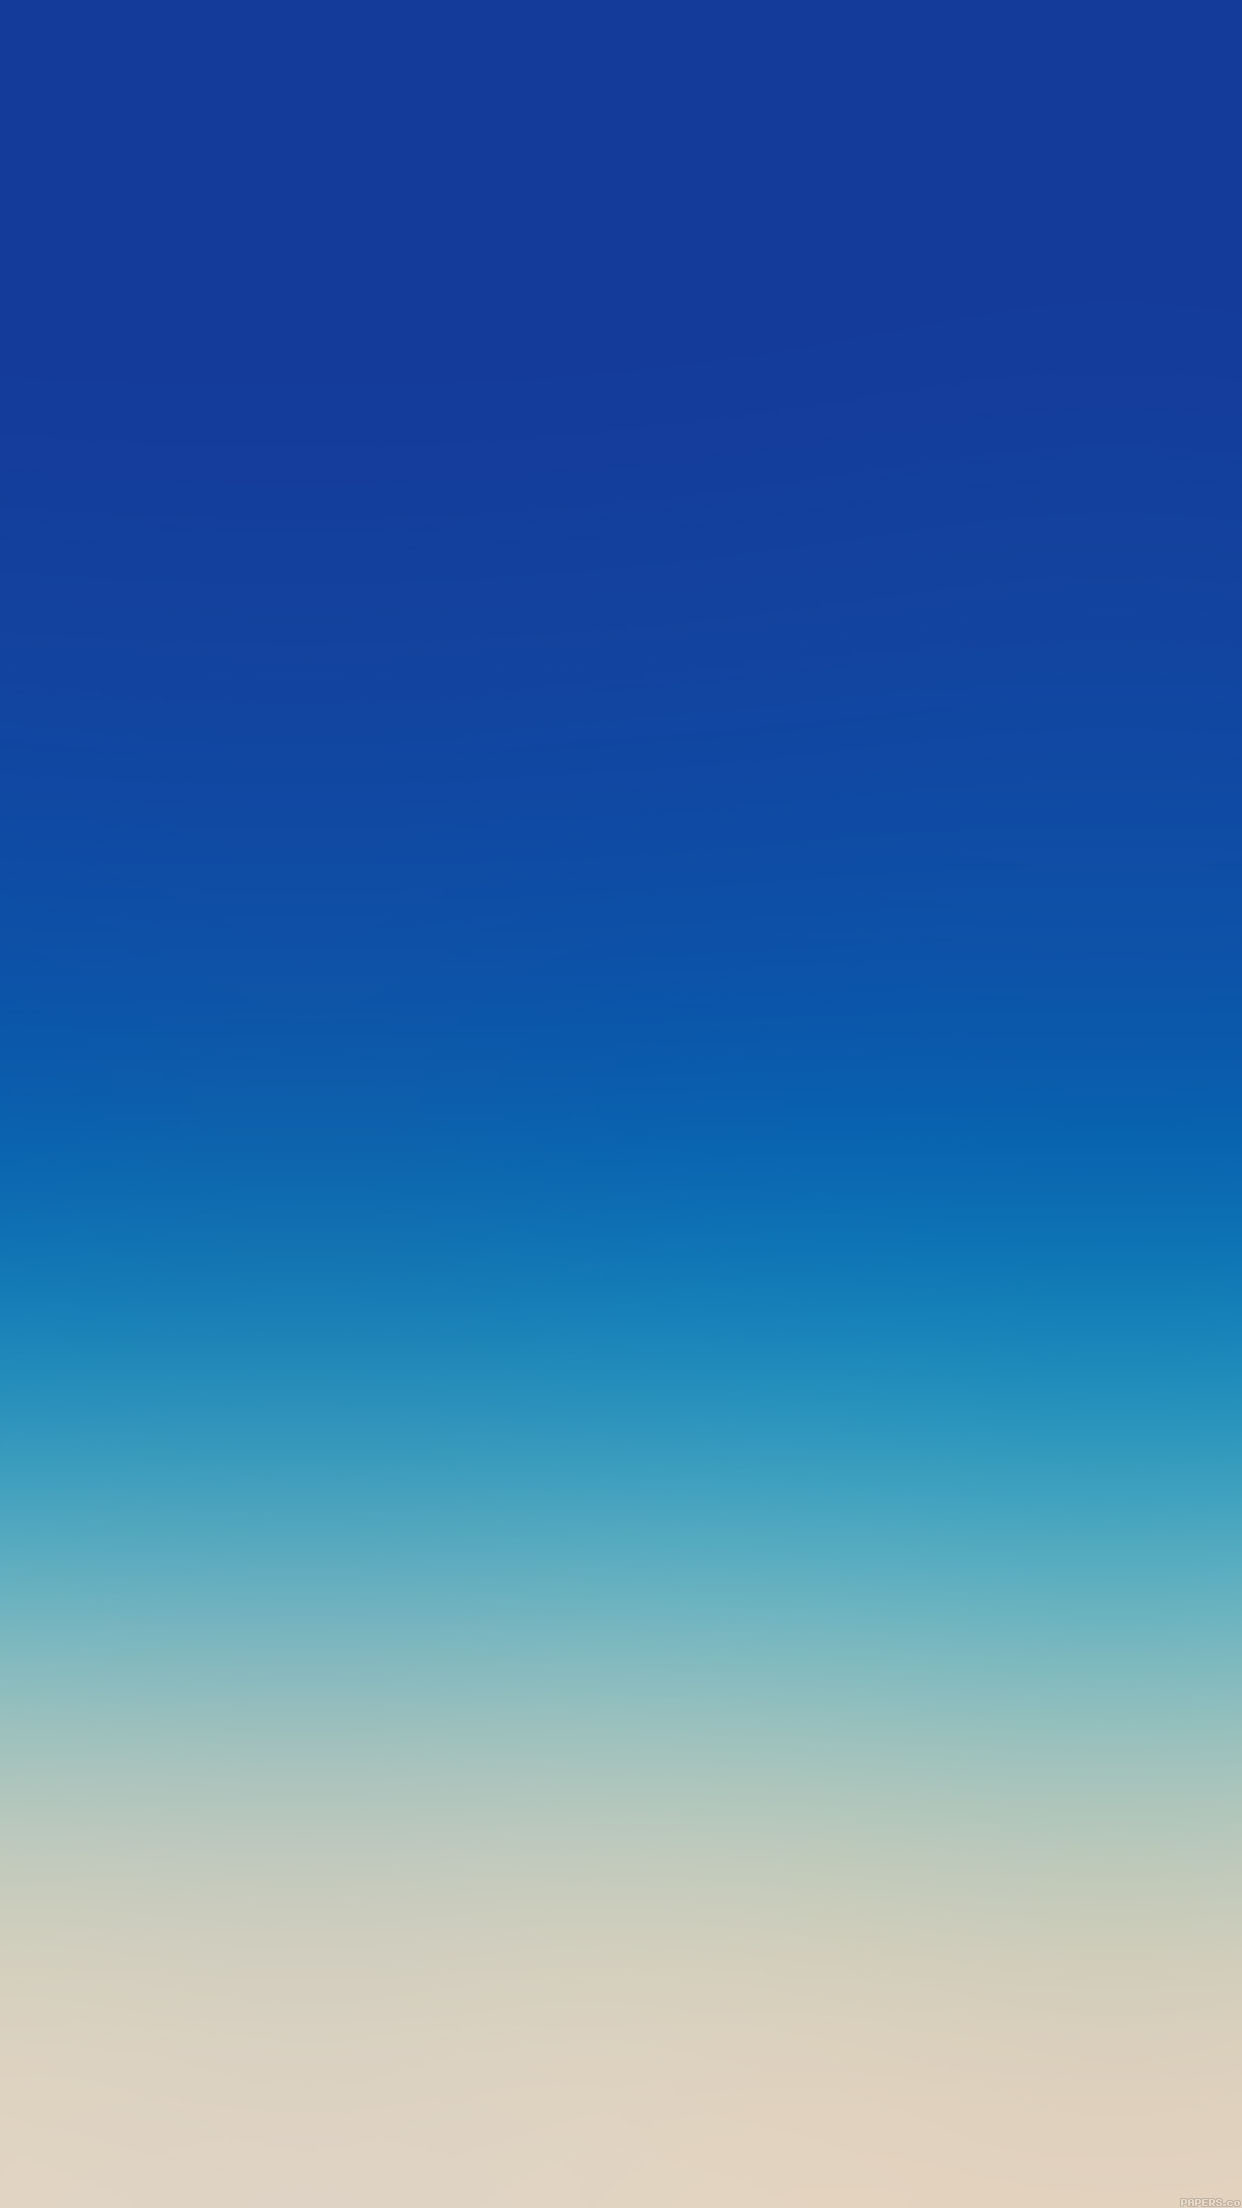 Best Car Wallpaper App For Iphone X Iphonexpapers